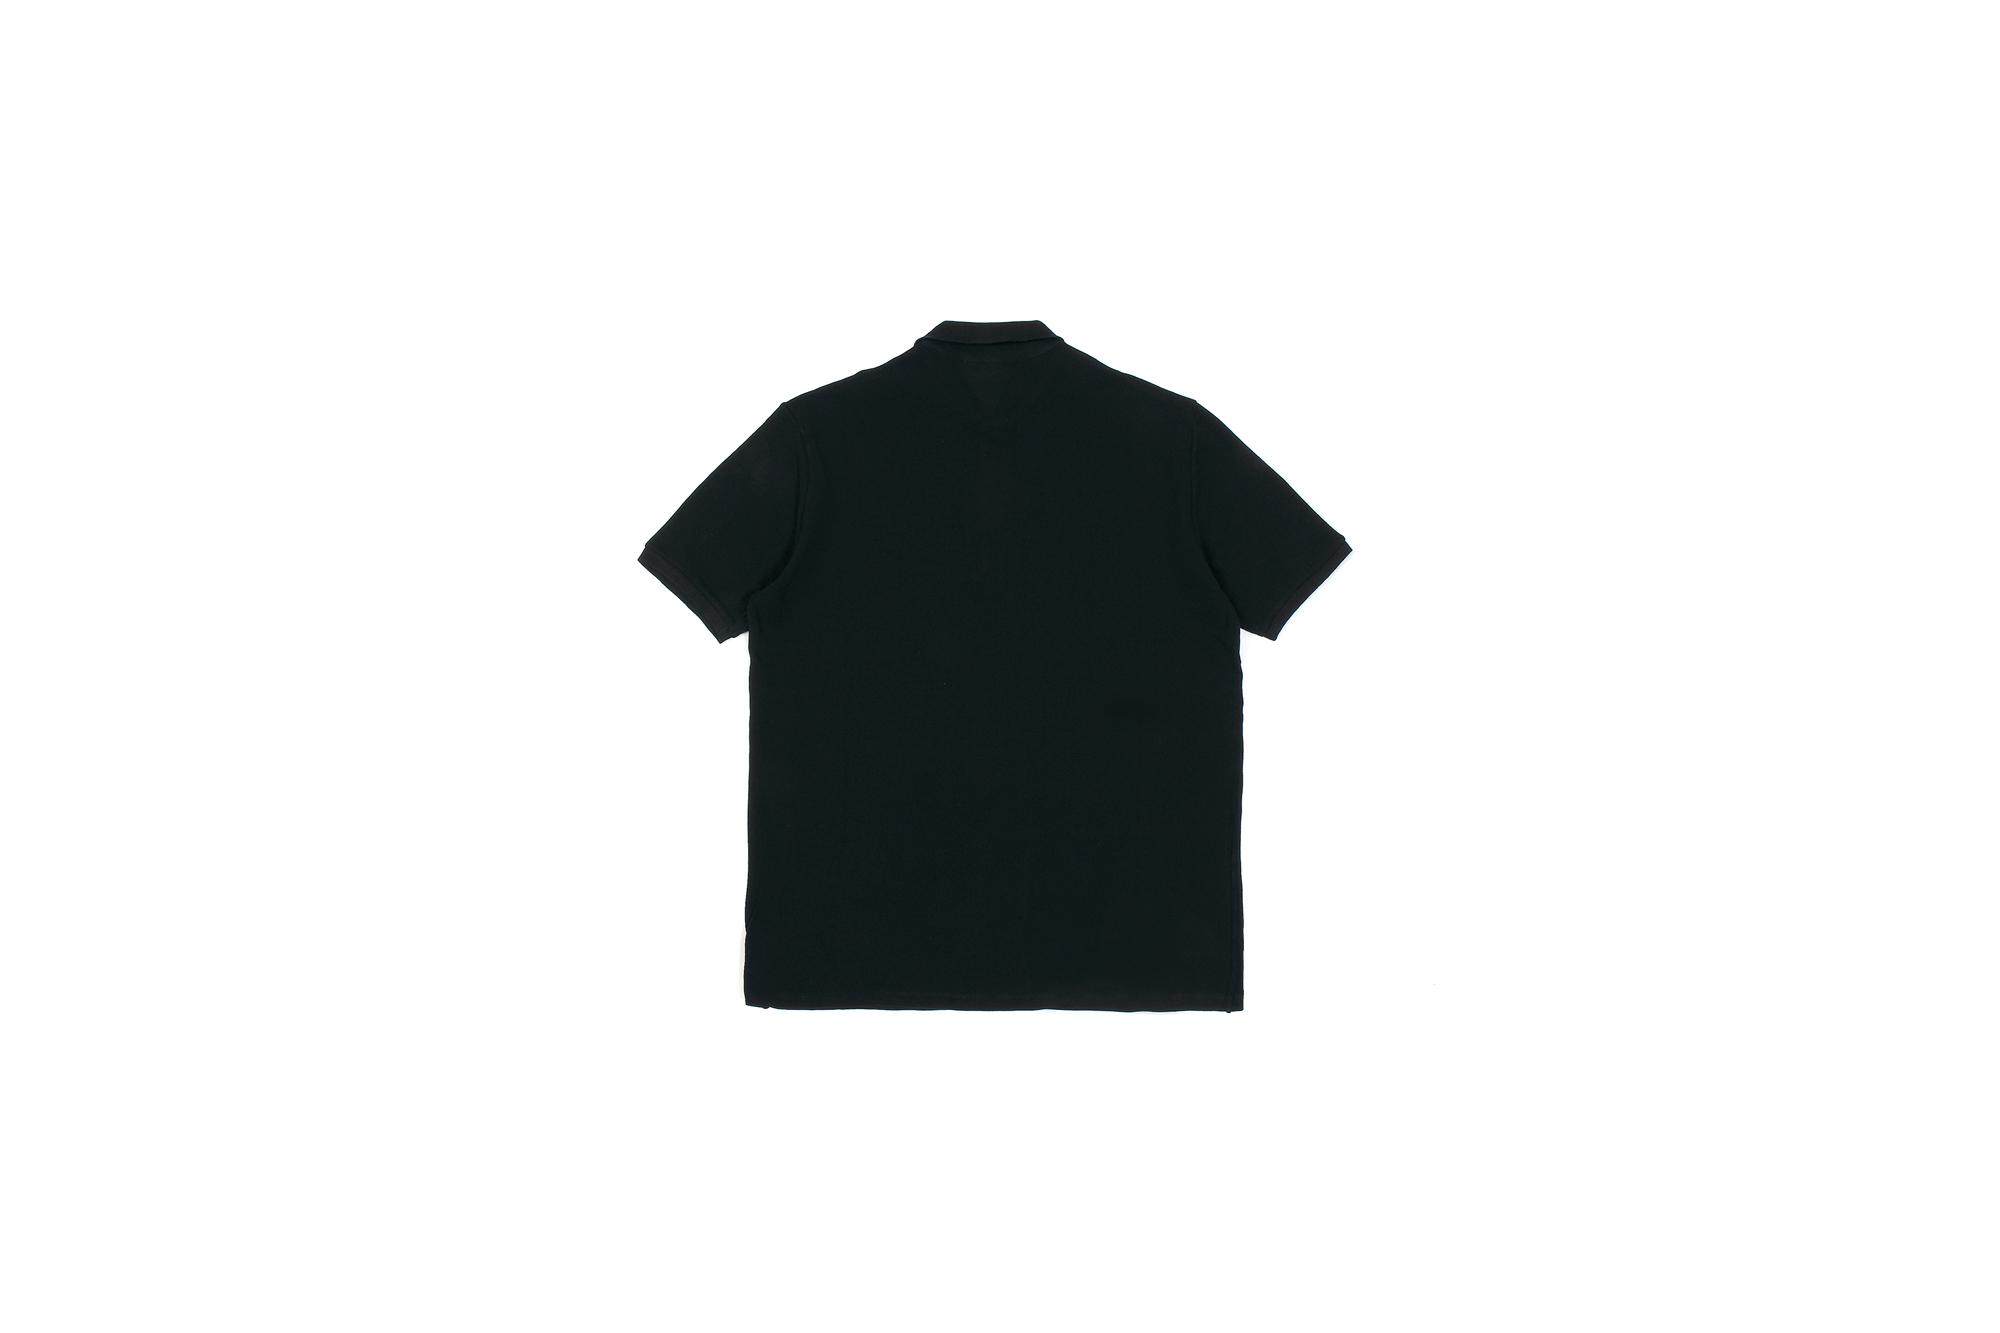 ZANONE(ザノーネ) Pique Polo Shirt ice cotton アイスコットン ピケポロシャツ BLACK (ブラック・Z0015) made in italy (イタリア製) 2020 春夏新作 愛知 名古屋 altoediritto アルトエデリット ポロシャツ